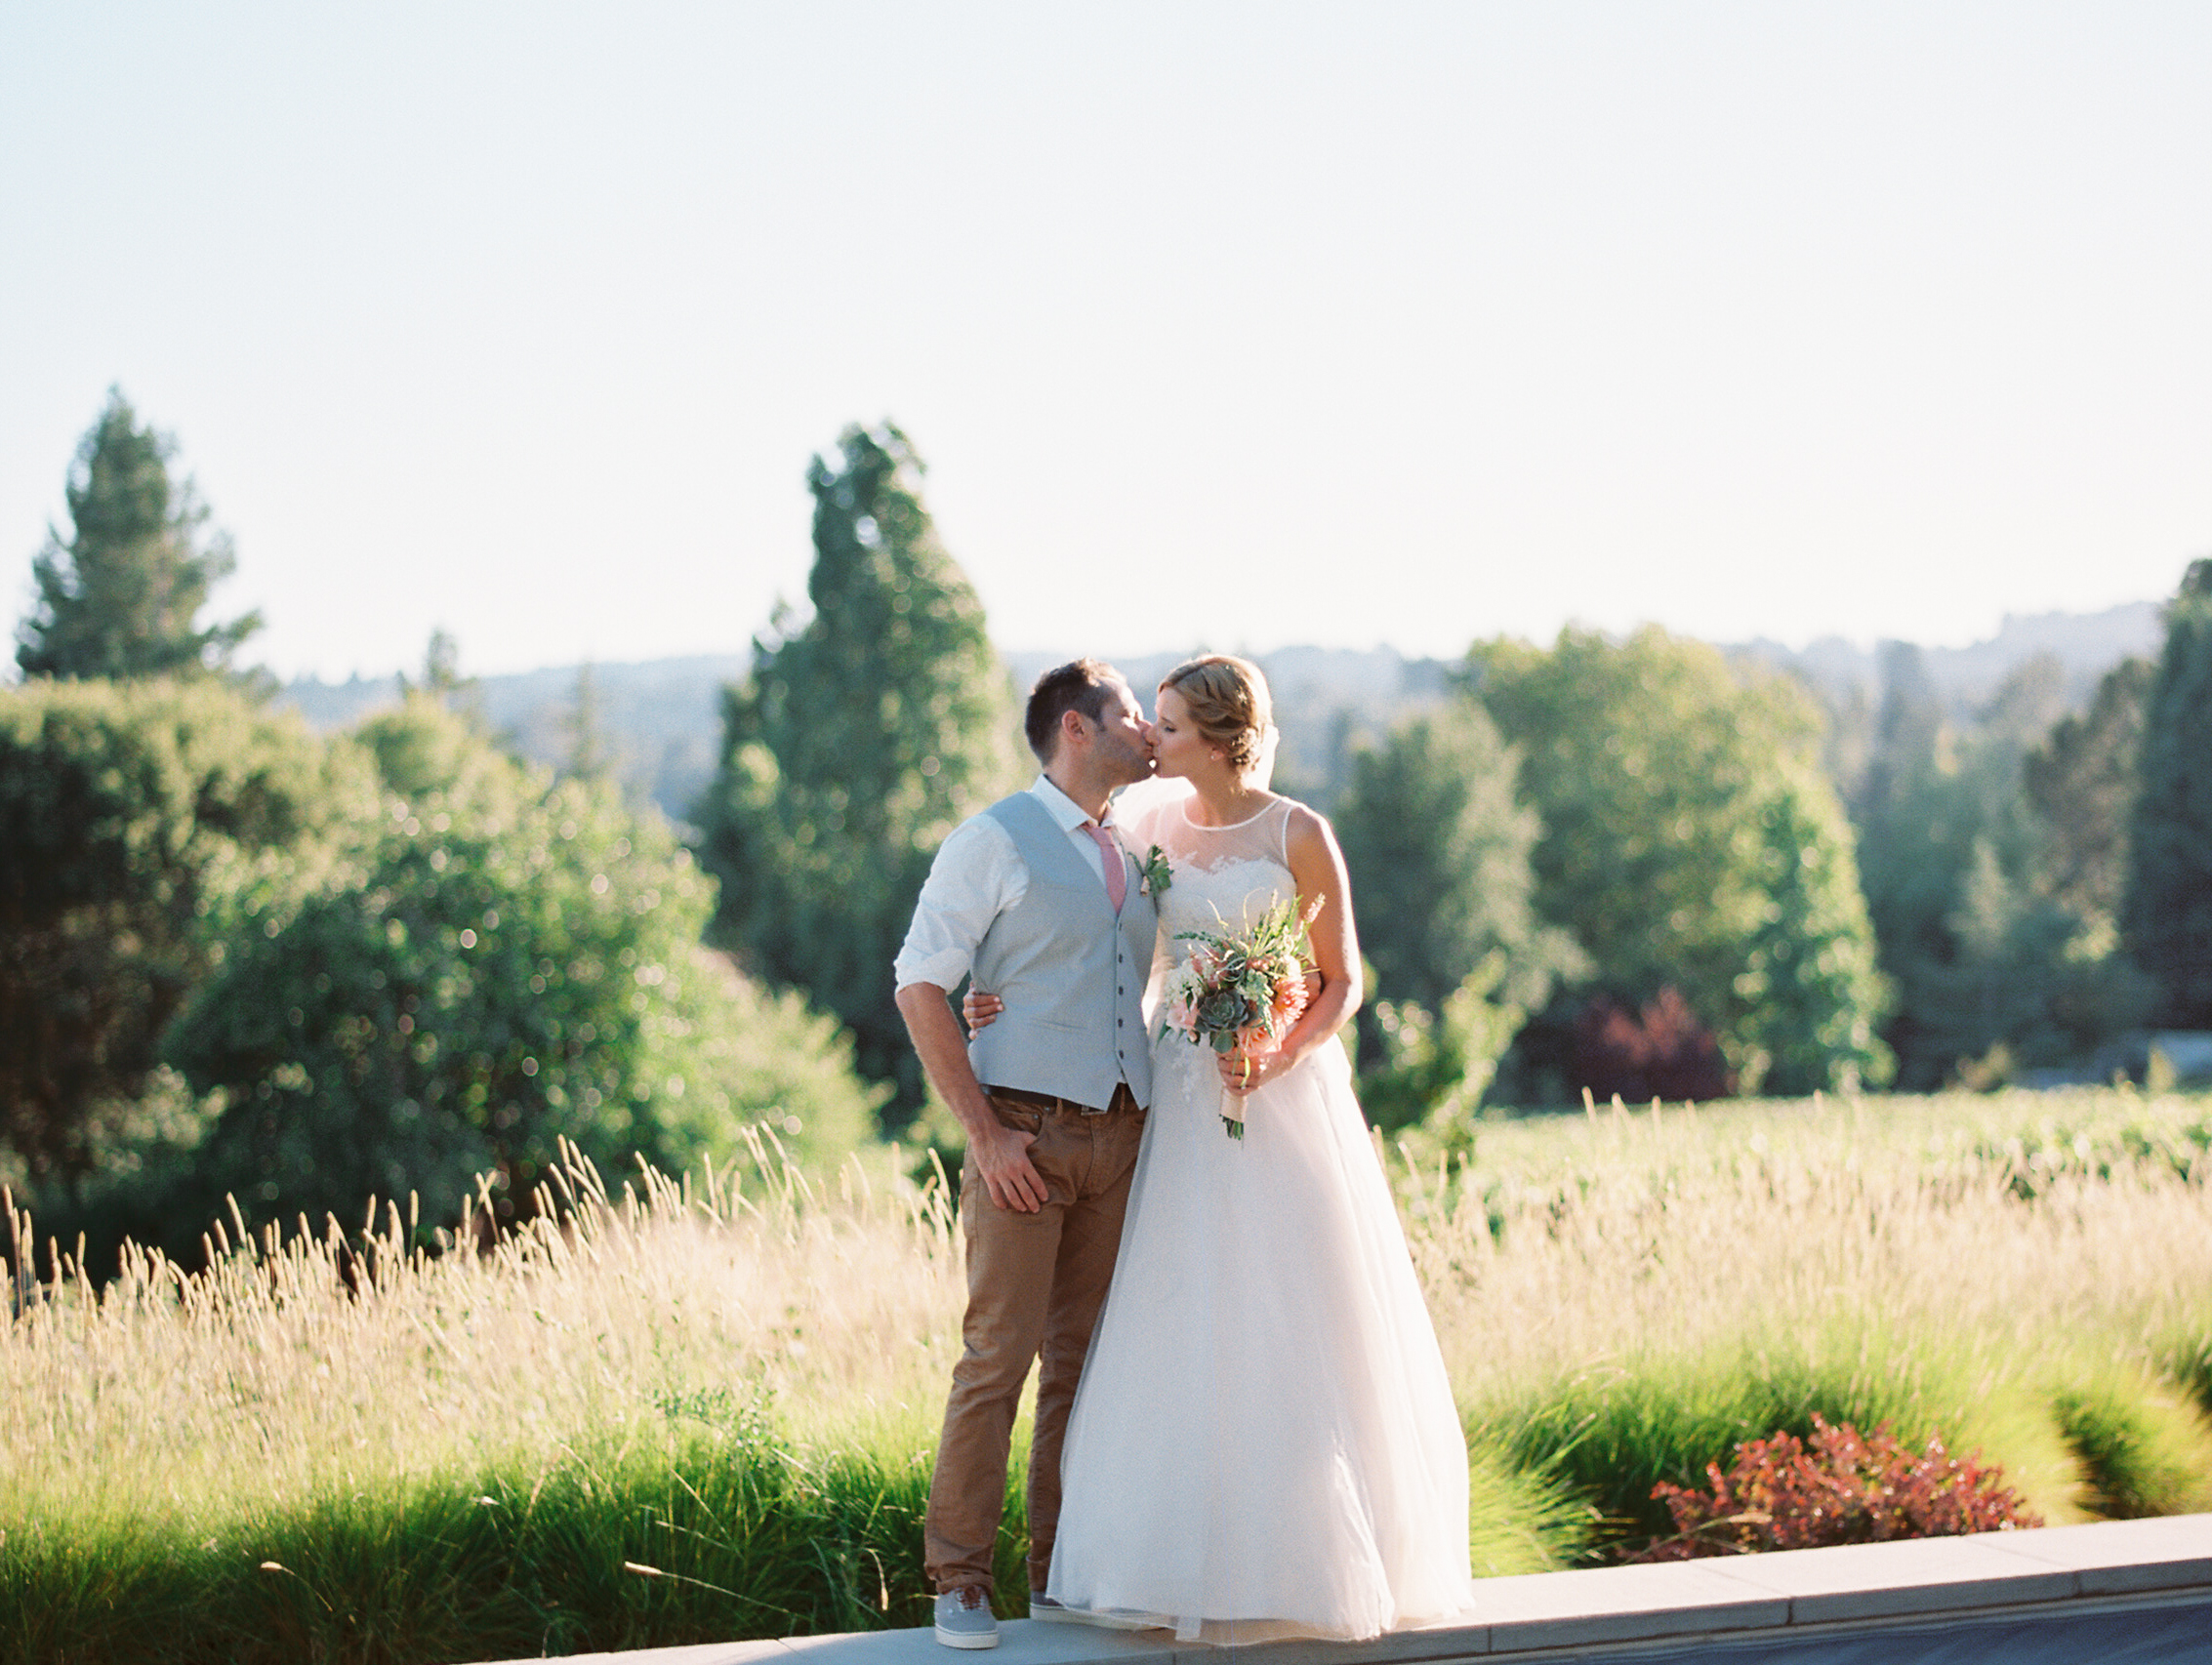 Anders Wedding by Jessica Garmon-401.JPG